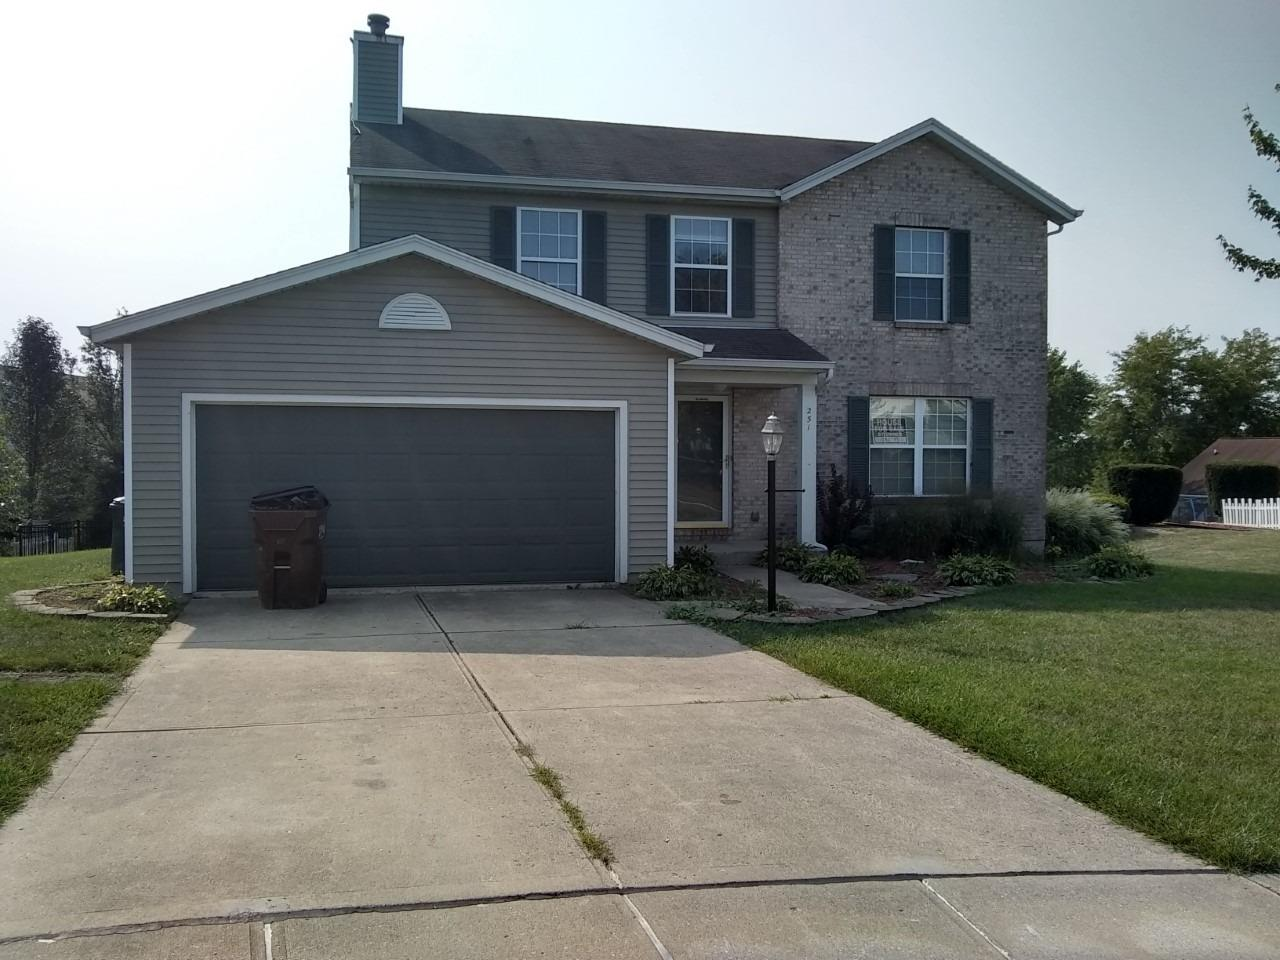 Property for sale at 251 Beaulieu Court, Lebanon,  Ohio 45036